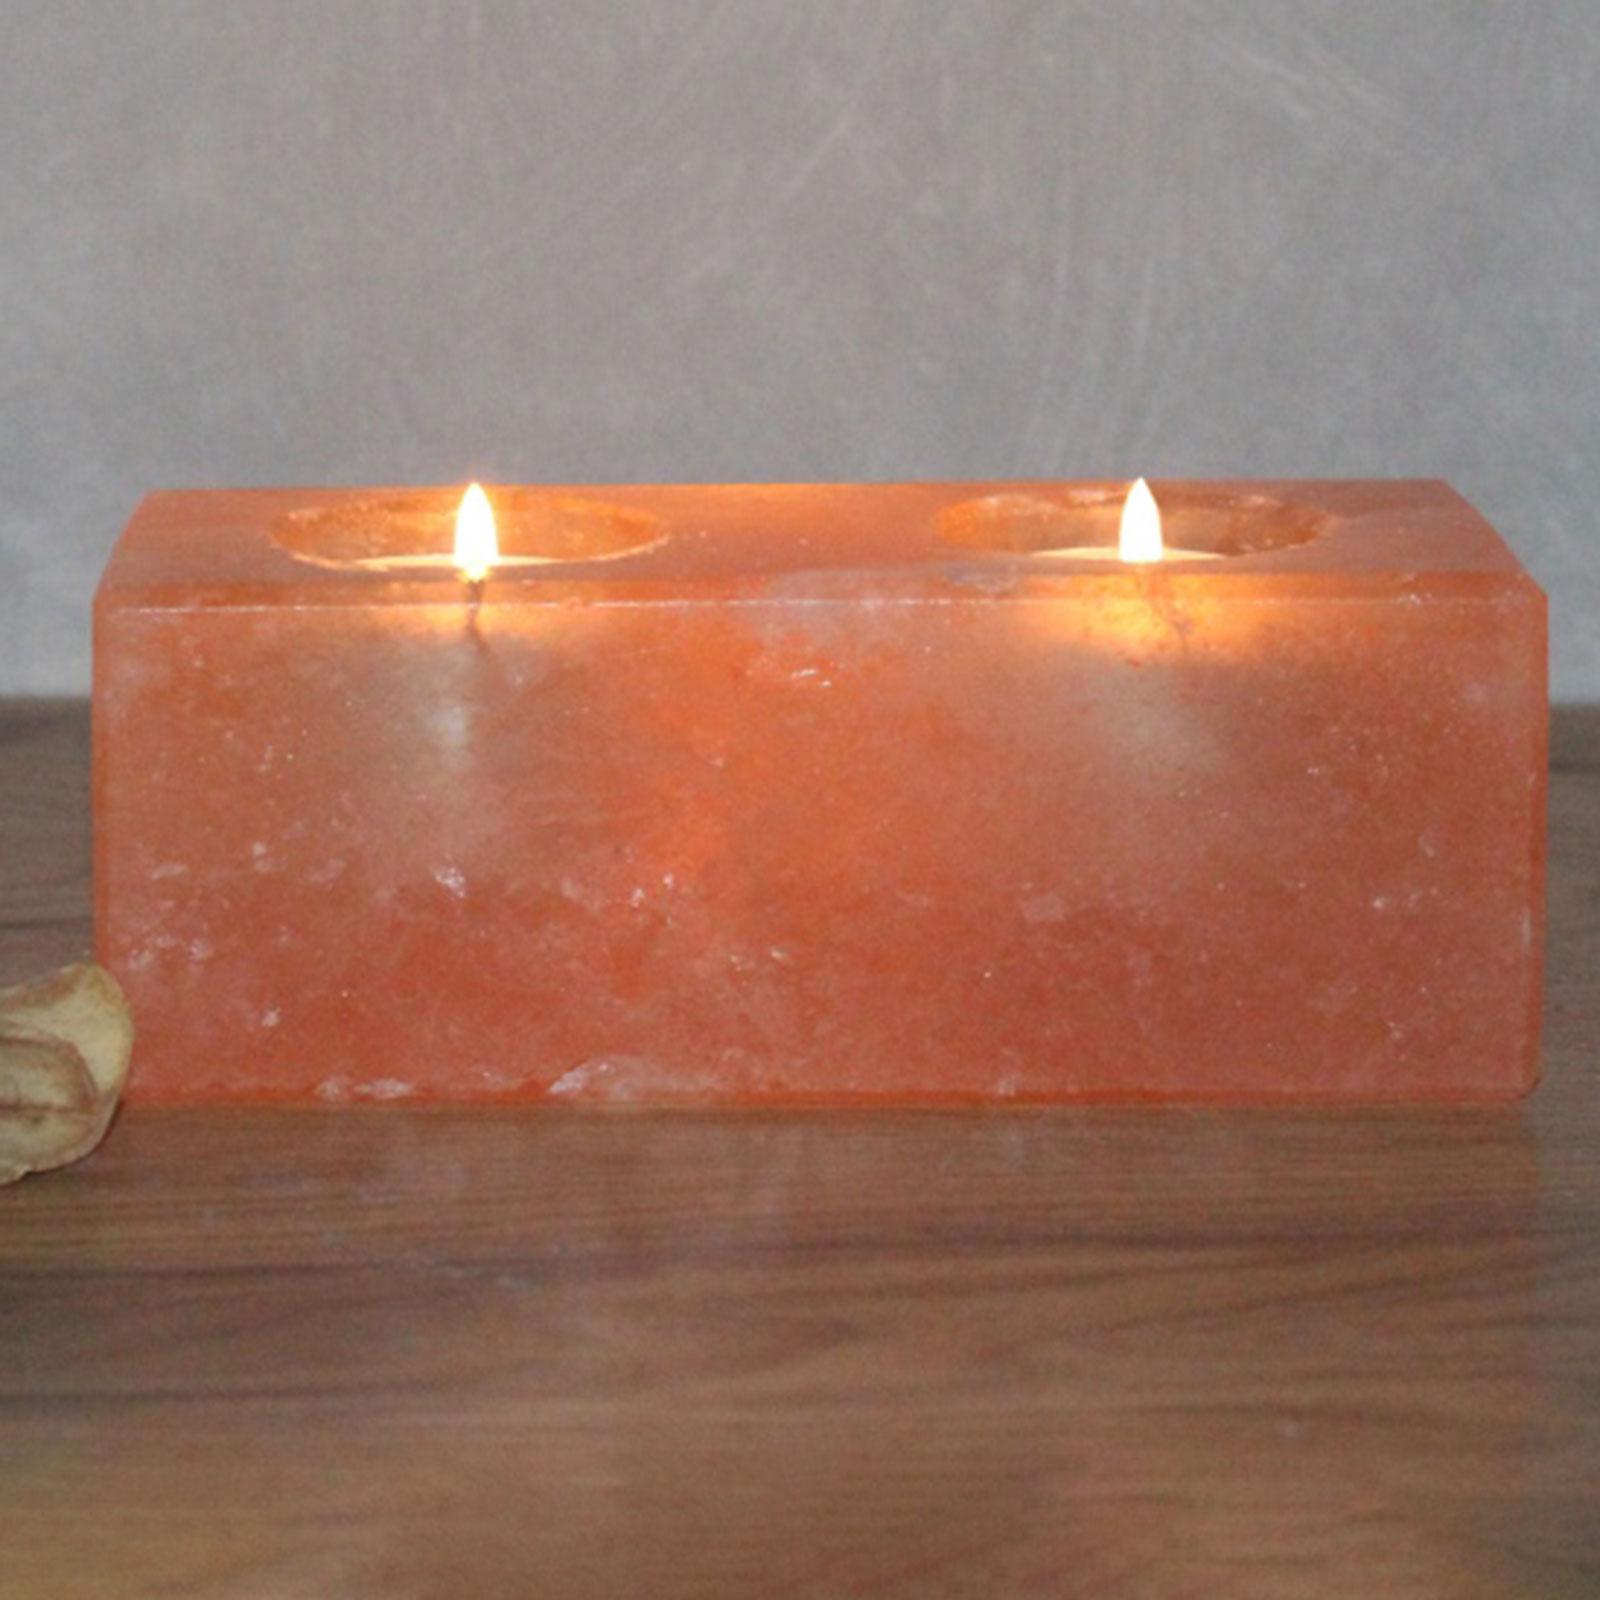 Twin Cube fyrfadslysestage, saltkrystal